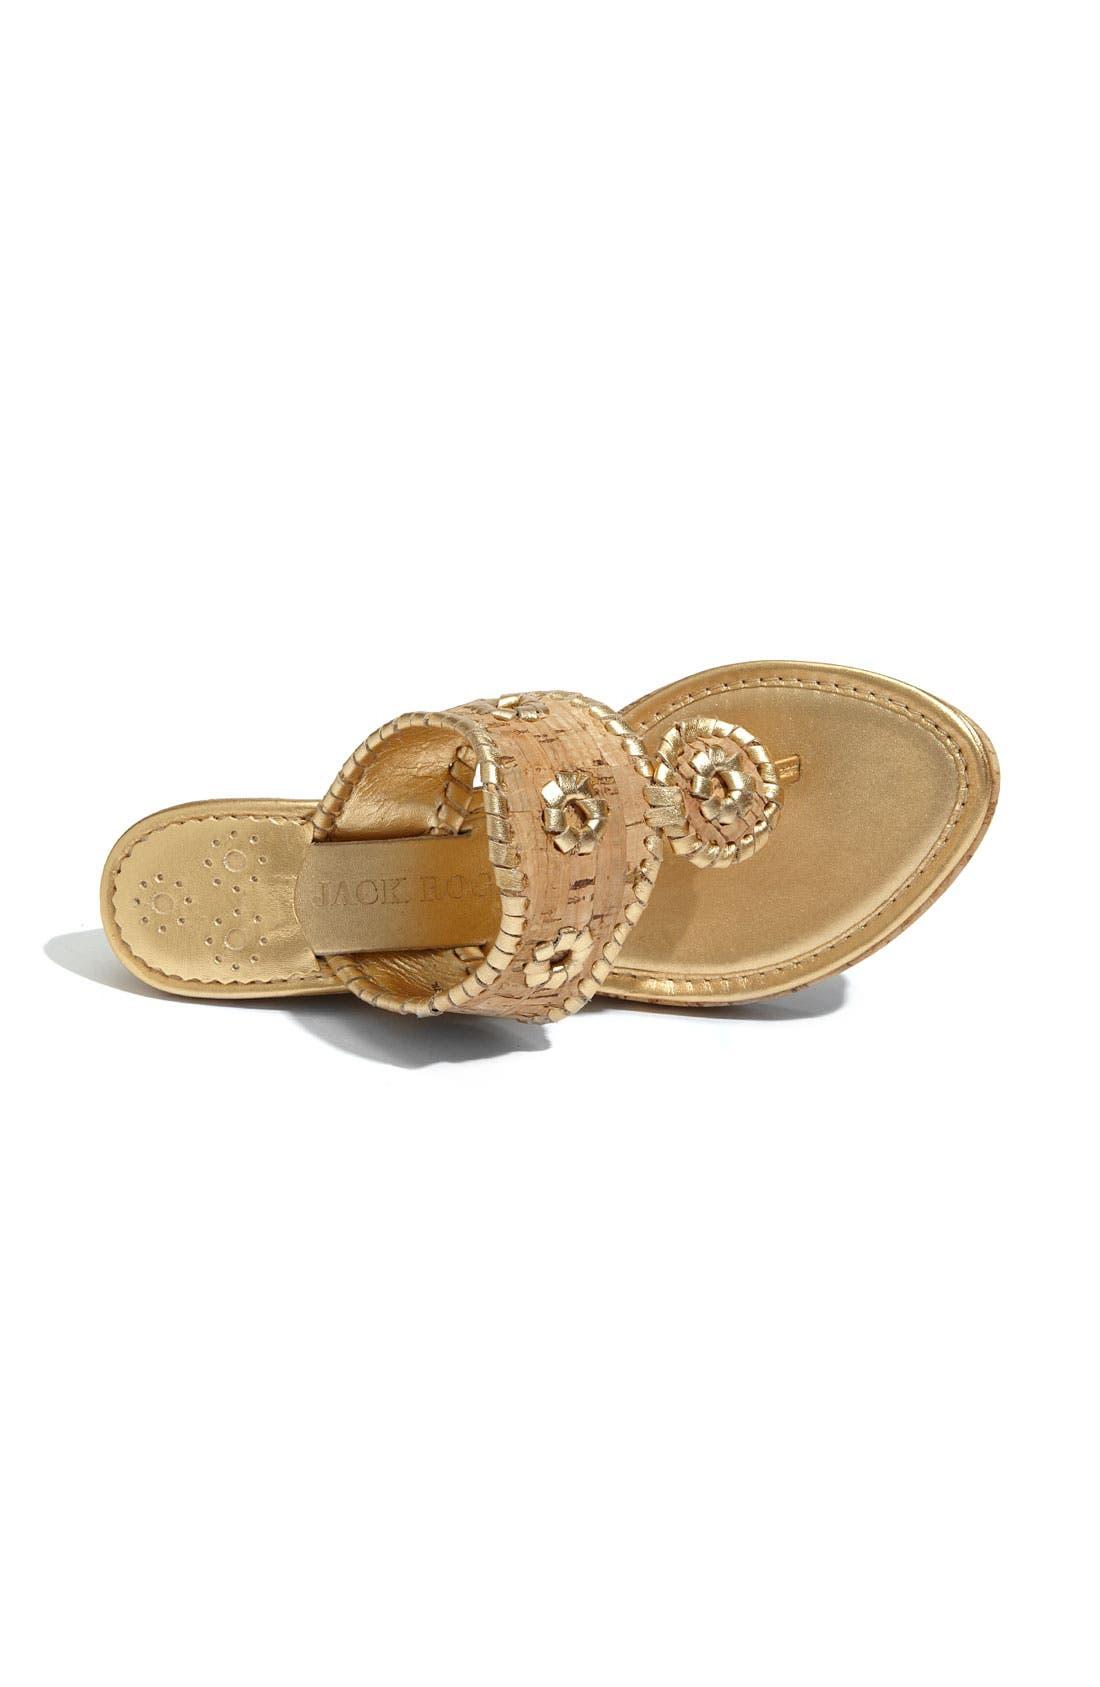 Alternate Image 3  - Jack Rogers 'Marbella' Cork Sandal